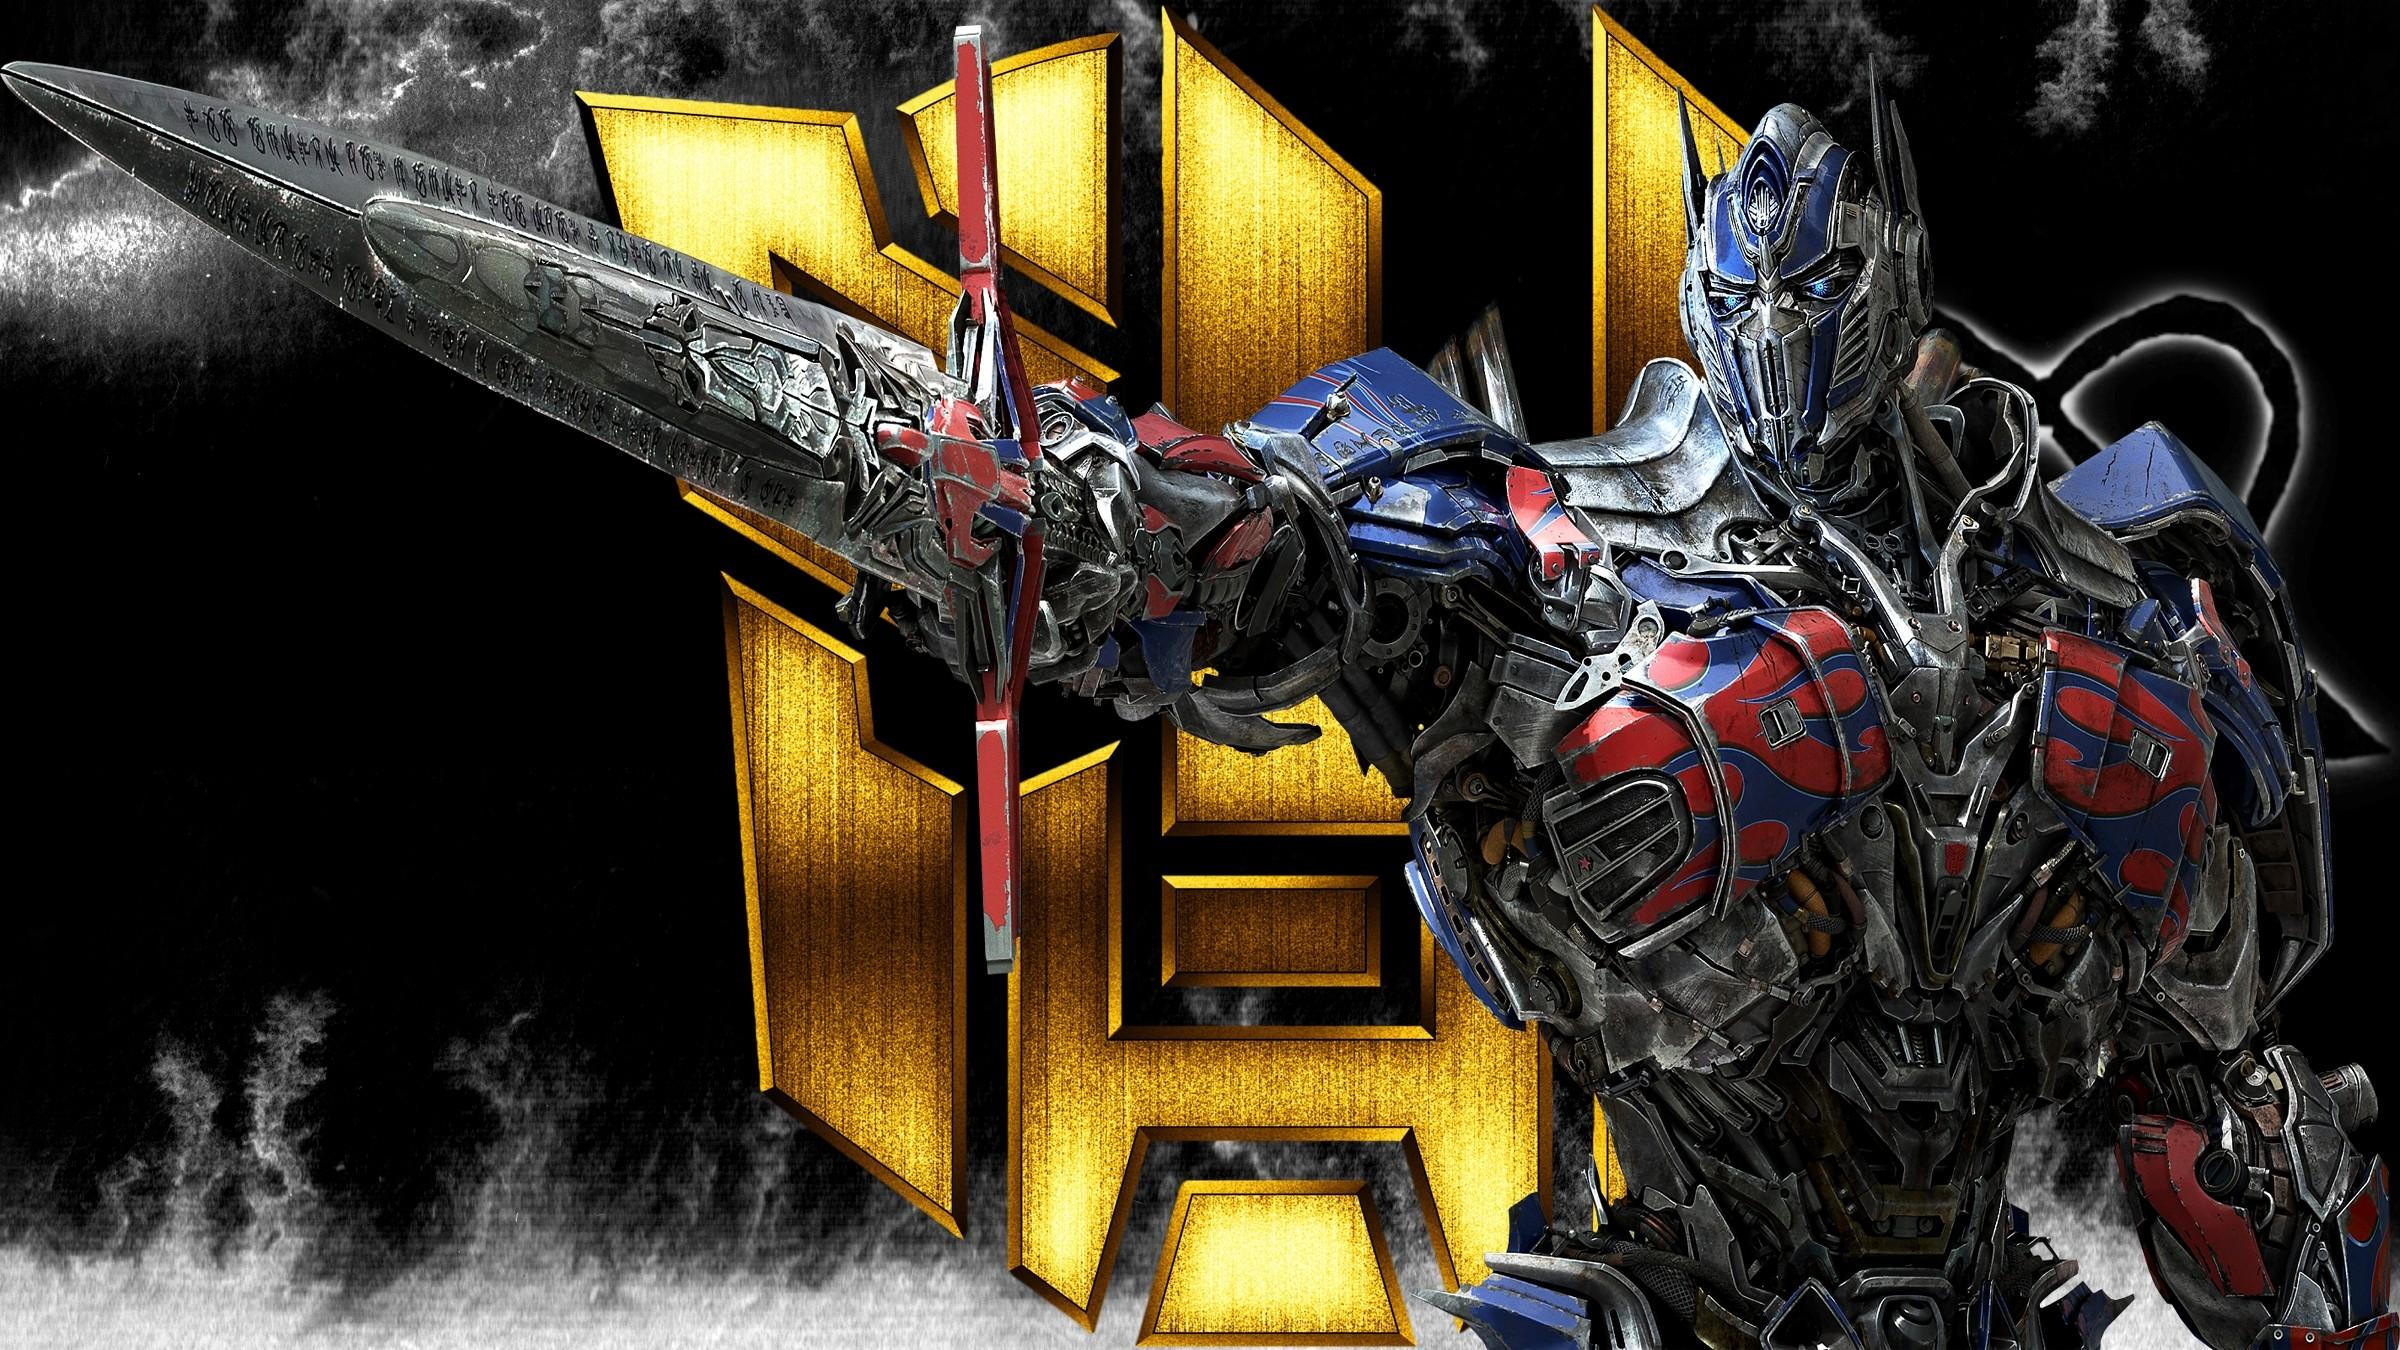 2560x1600 Cartoons Ironhide Optimus Prime Ratchet Transformers G1